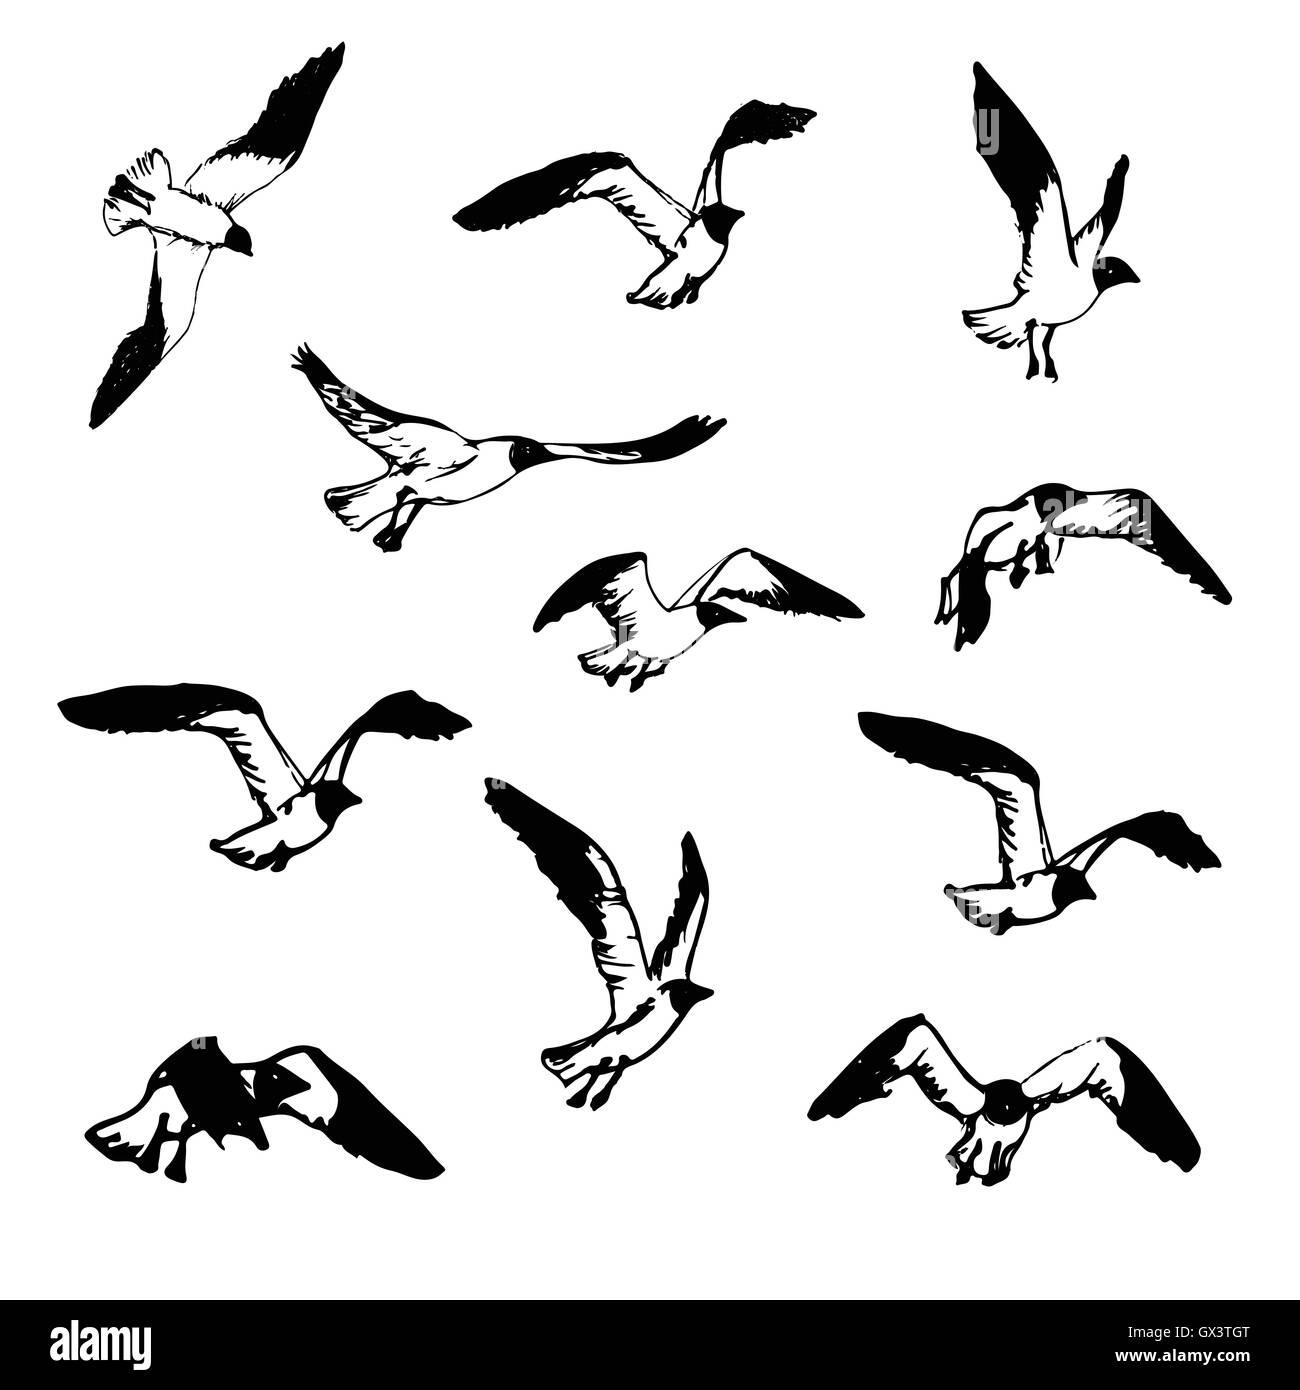 seagull sketch stockfotos  seagull sketch bilder  alamy